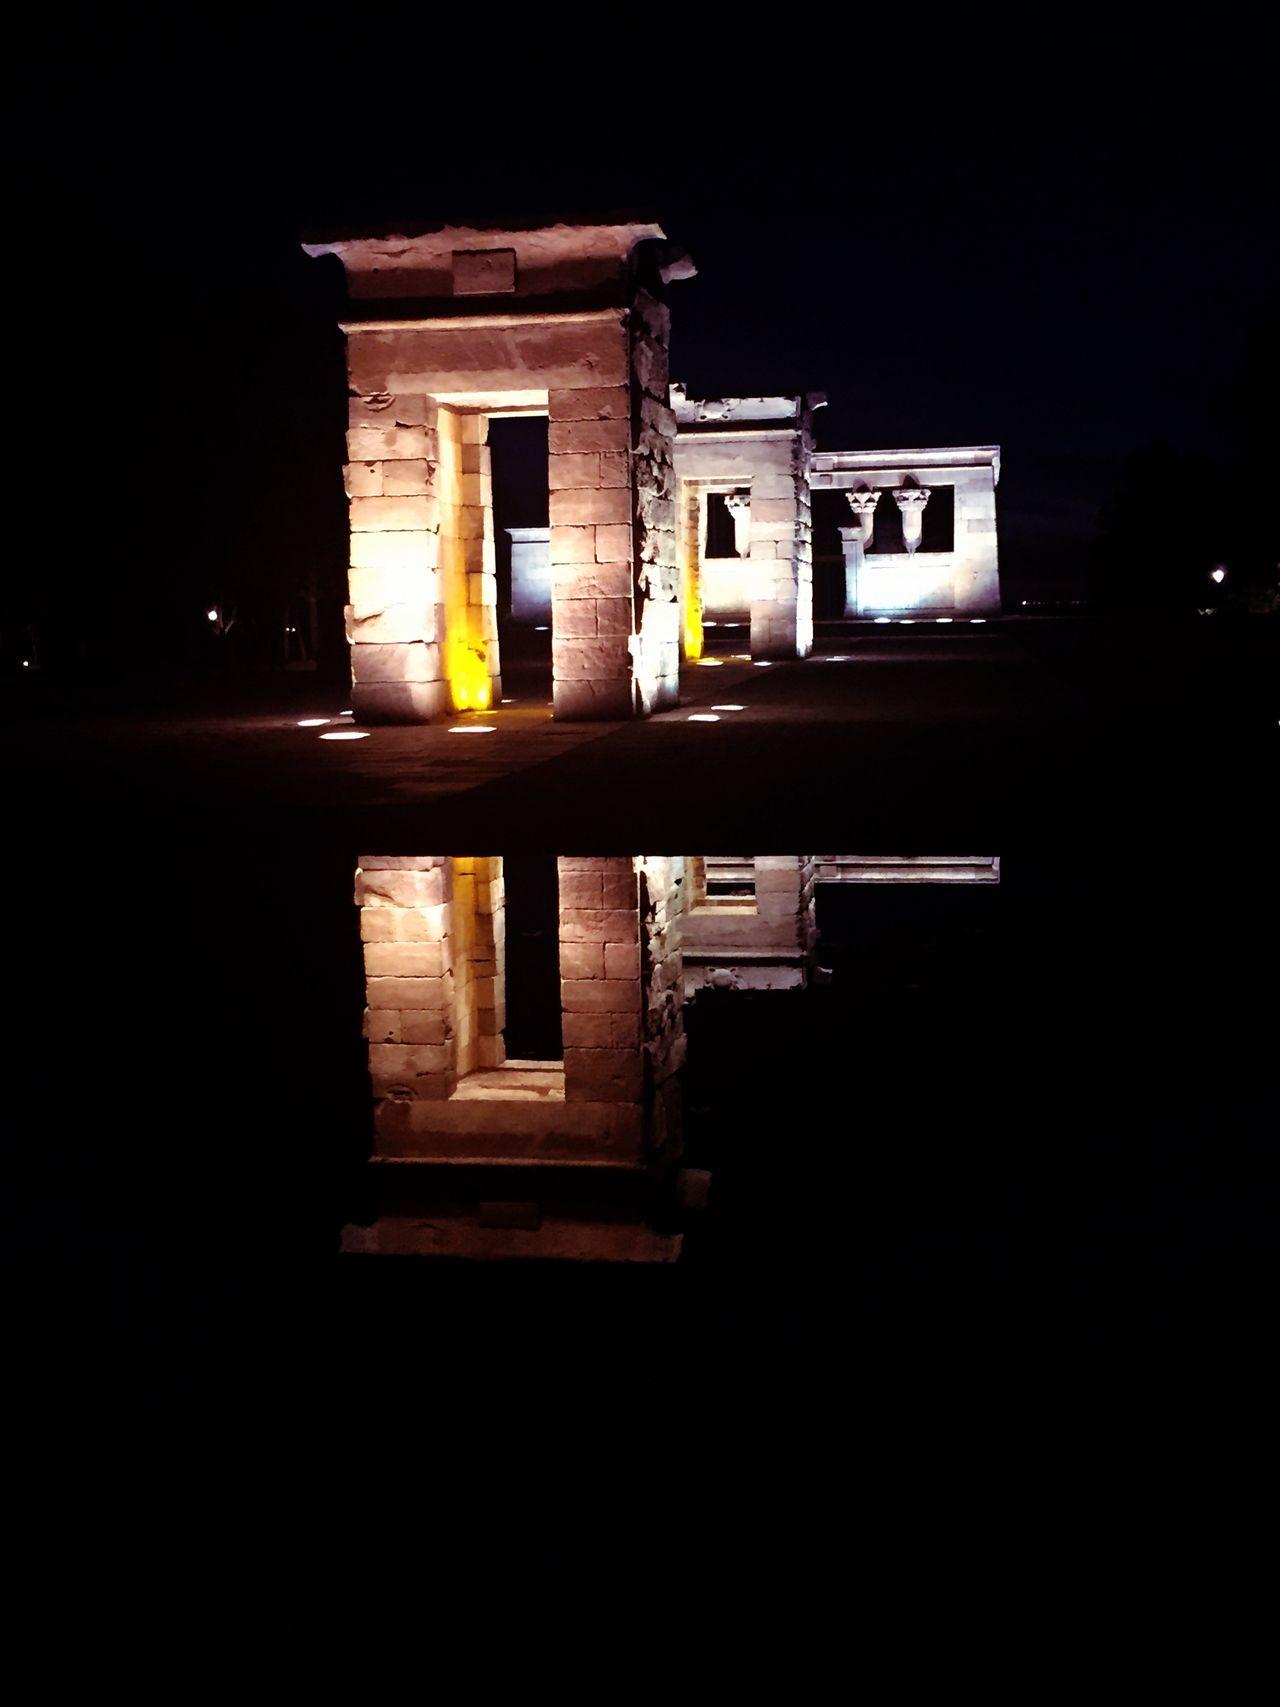 El templo de Debod Taking Photos EyeEm Best Shots Universodepequeñascosas Madrid SPAIN